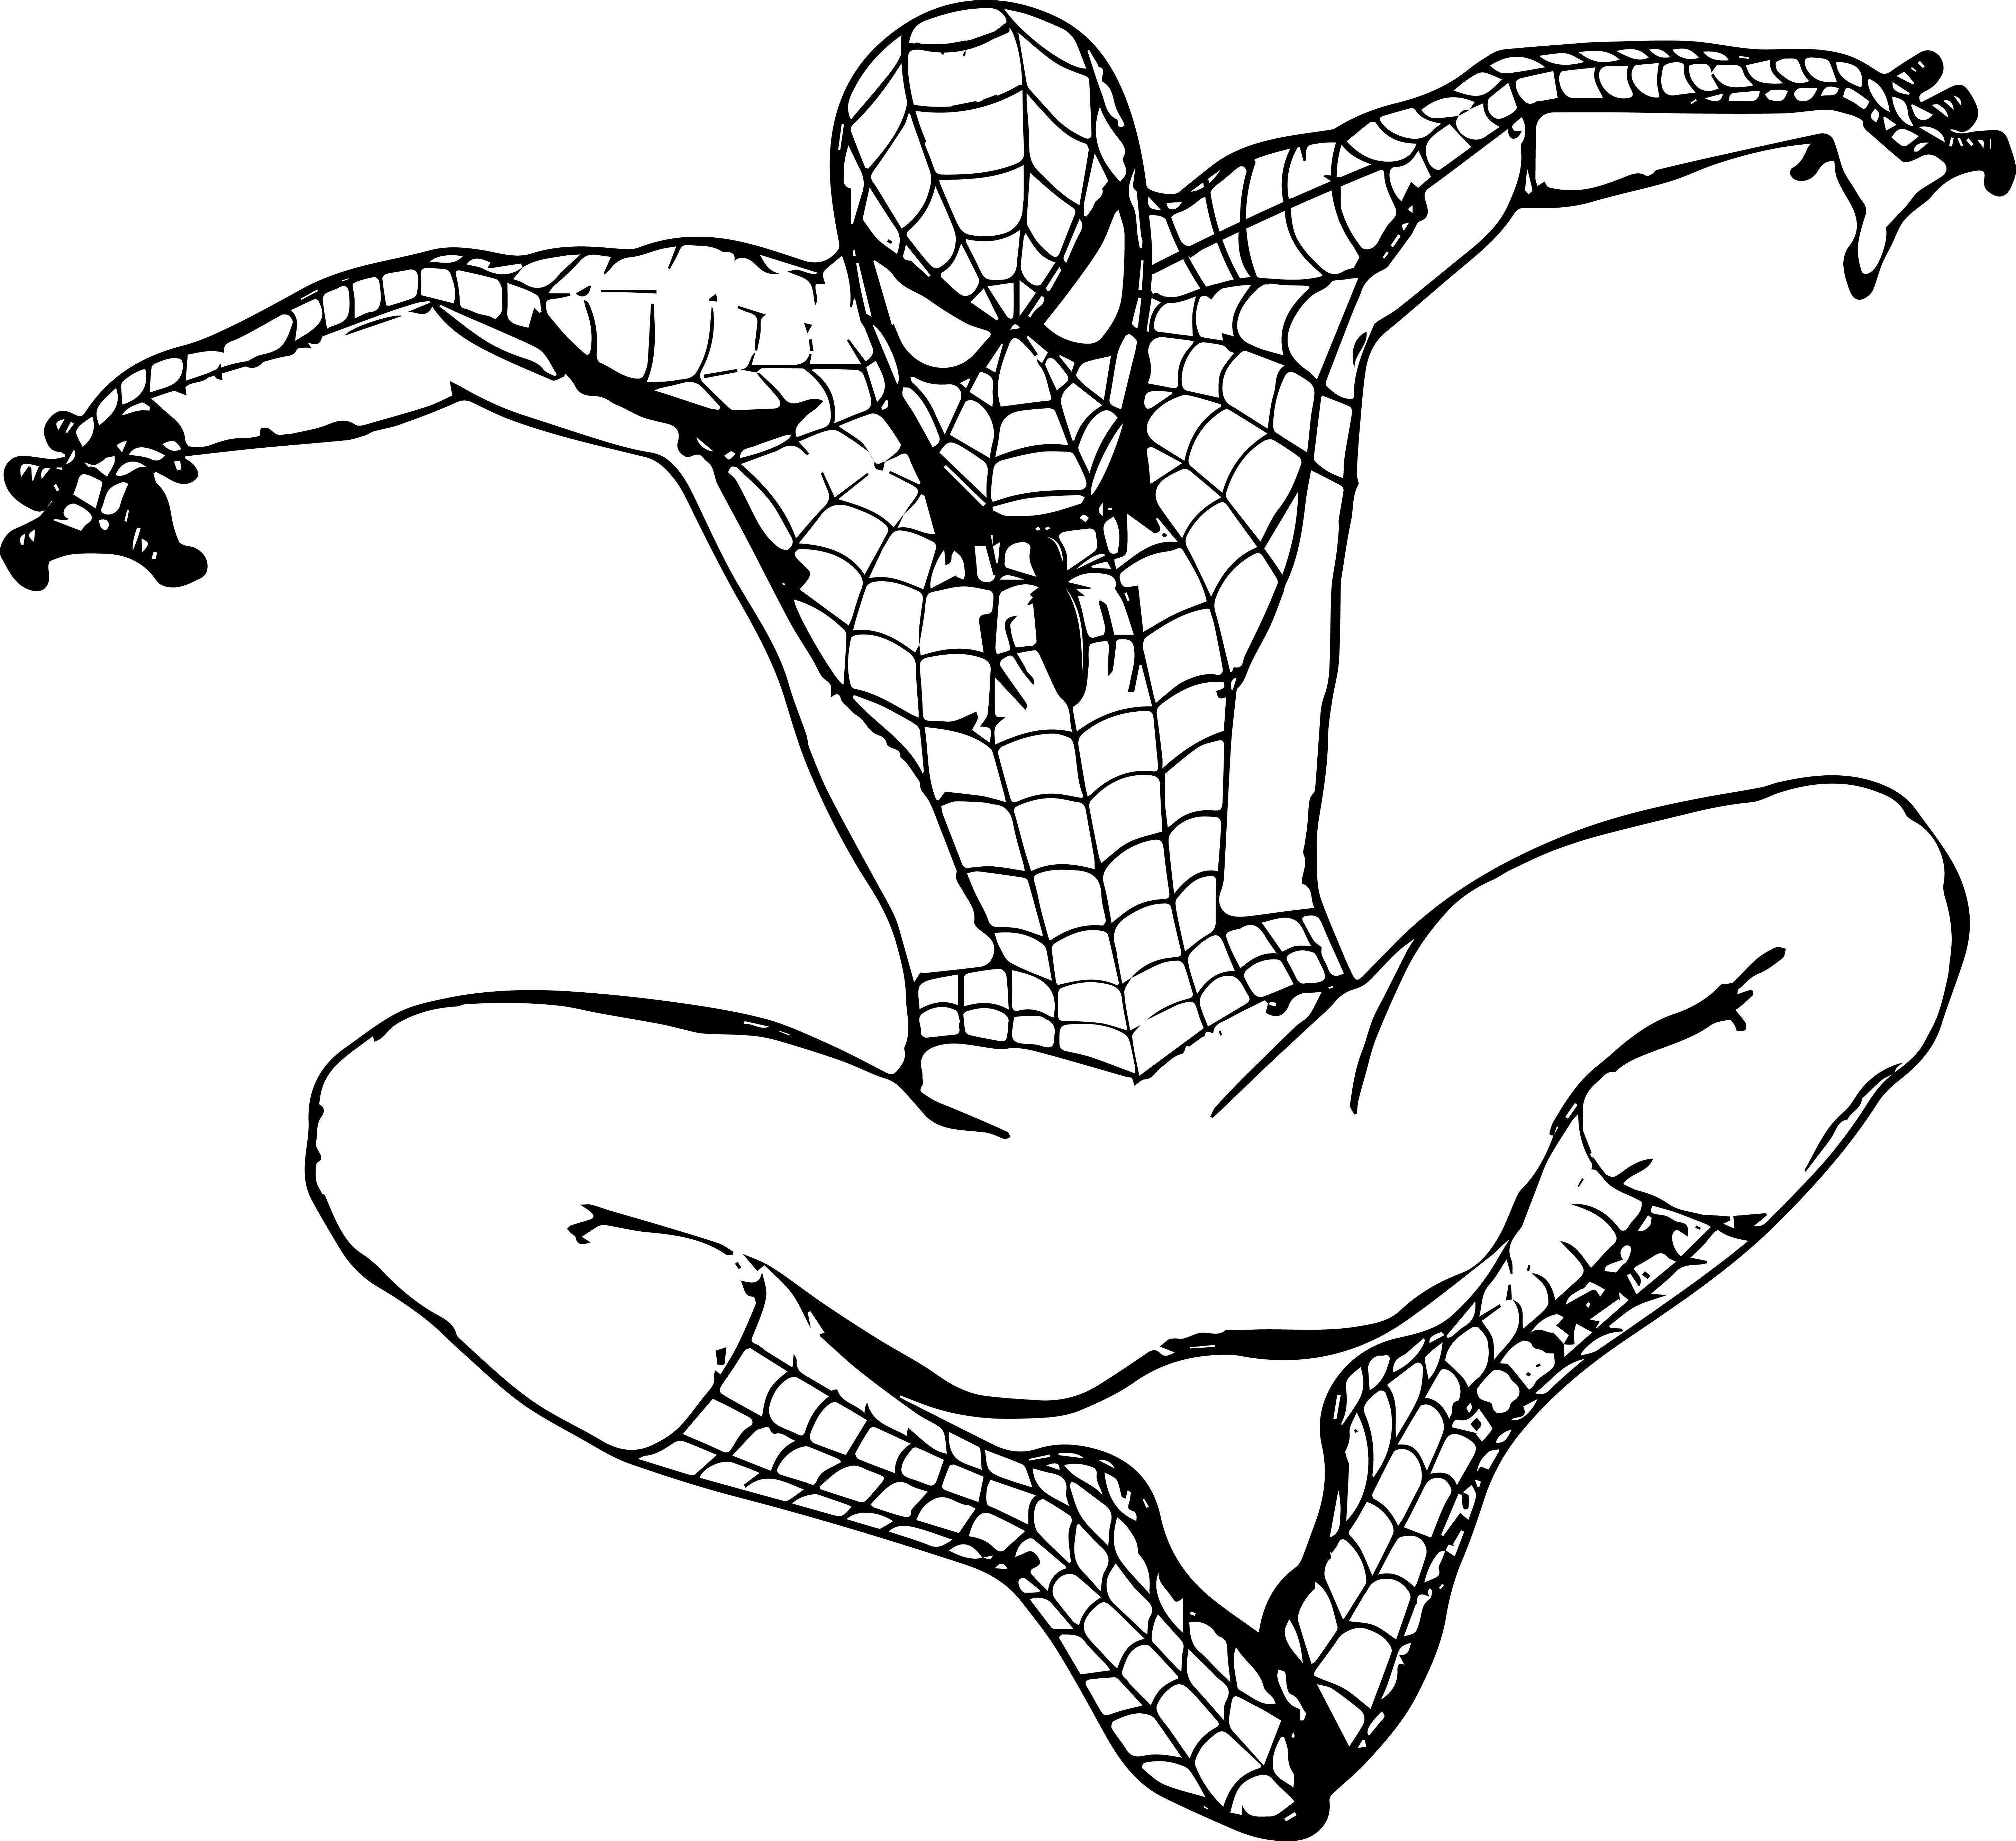 Spiderman Cartoon Drawing at GetDrawings.com Free for